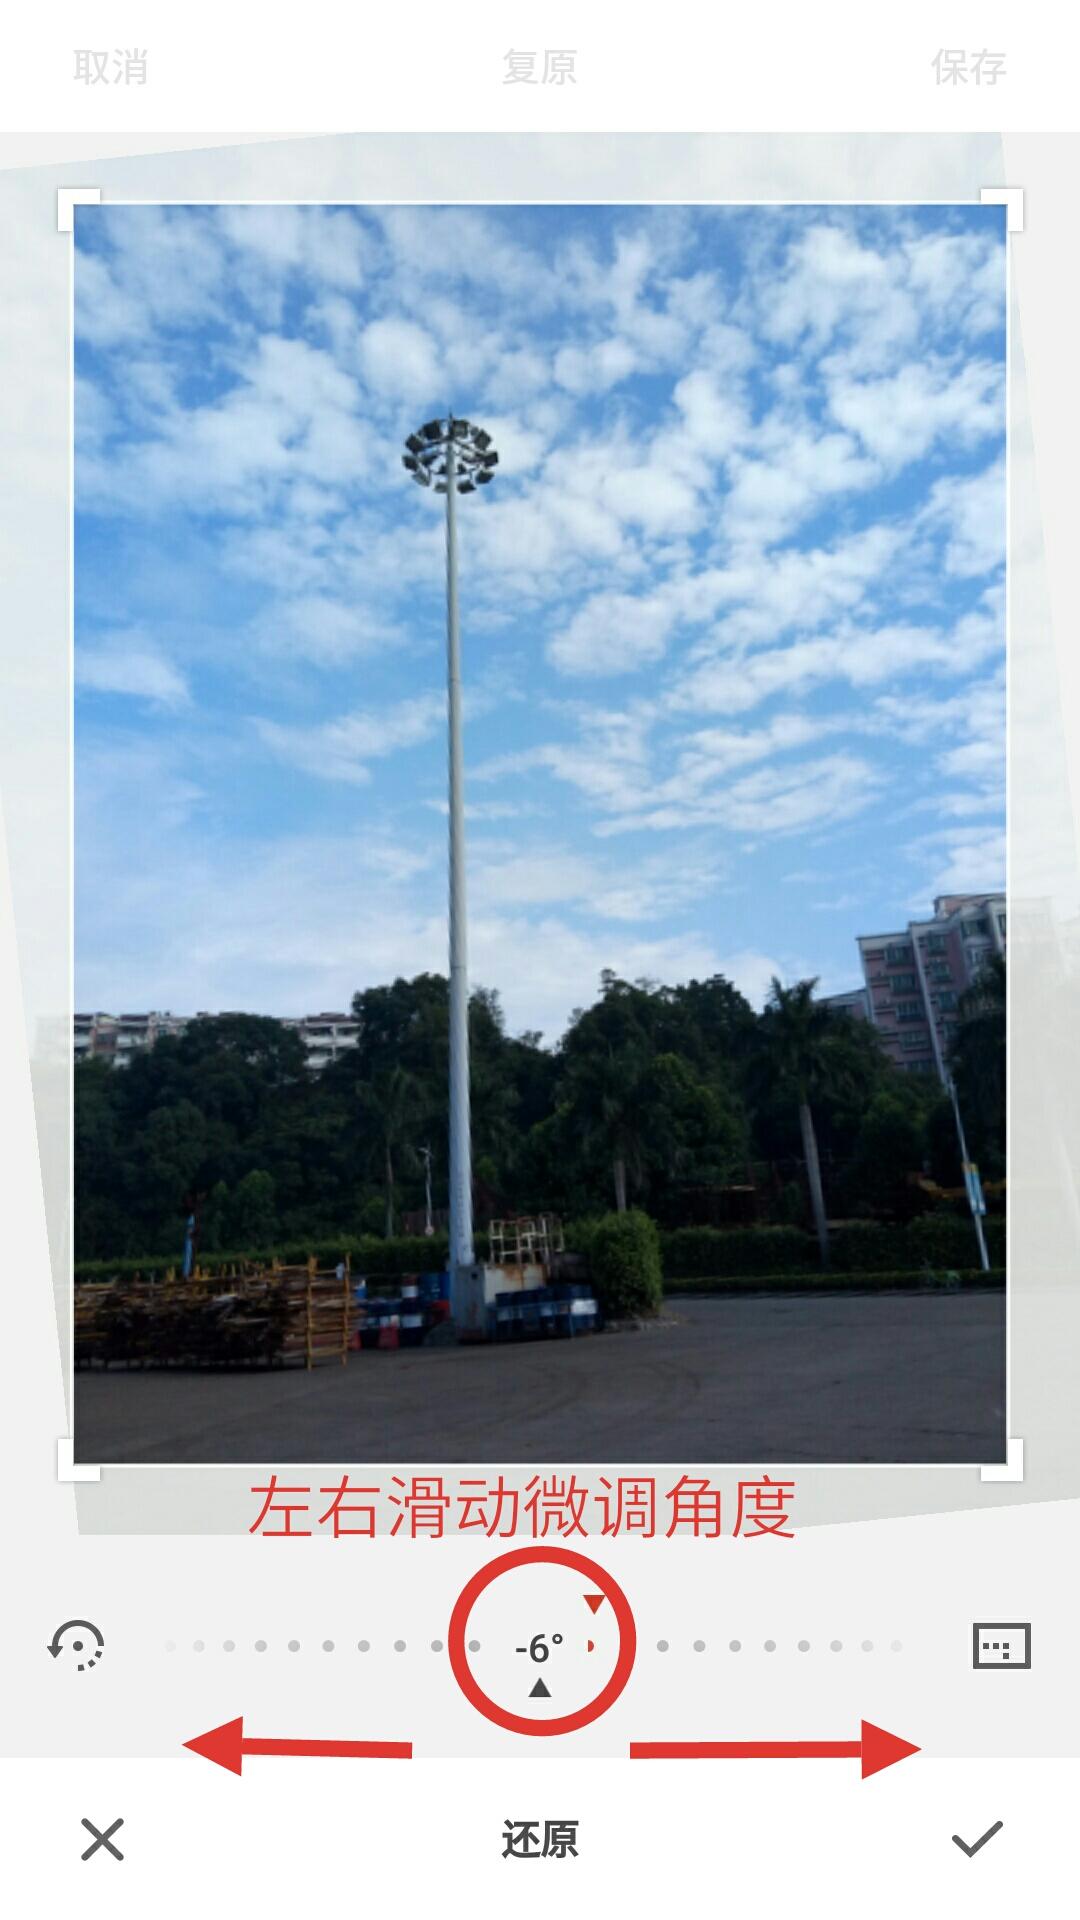 S71207-234302(1).jpg